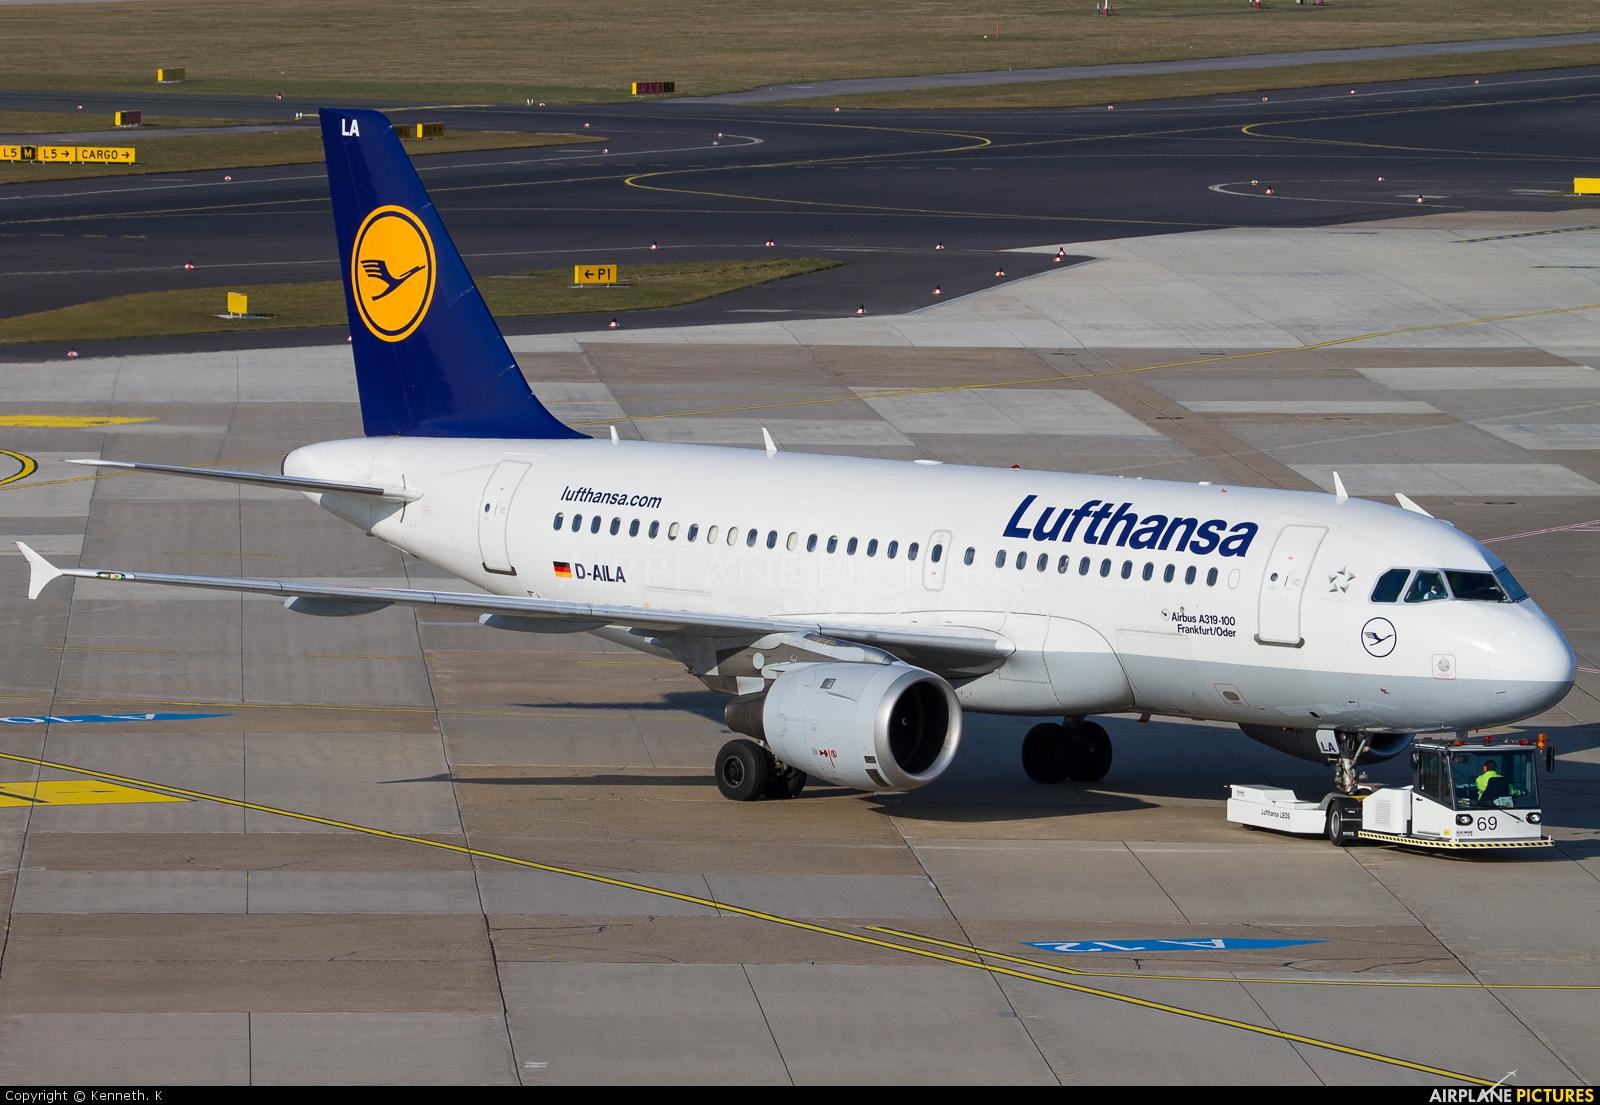 Lufthansa D-AILA aircraft at Düsseldorf